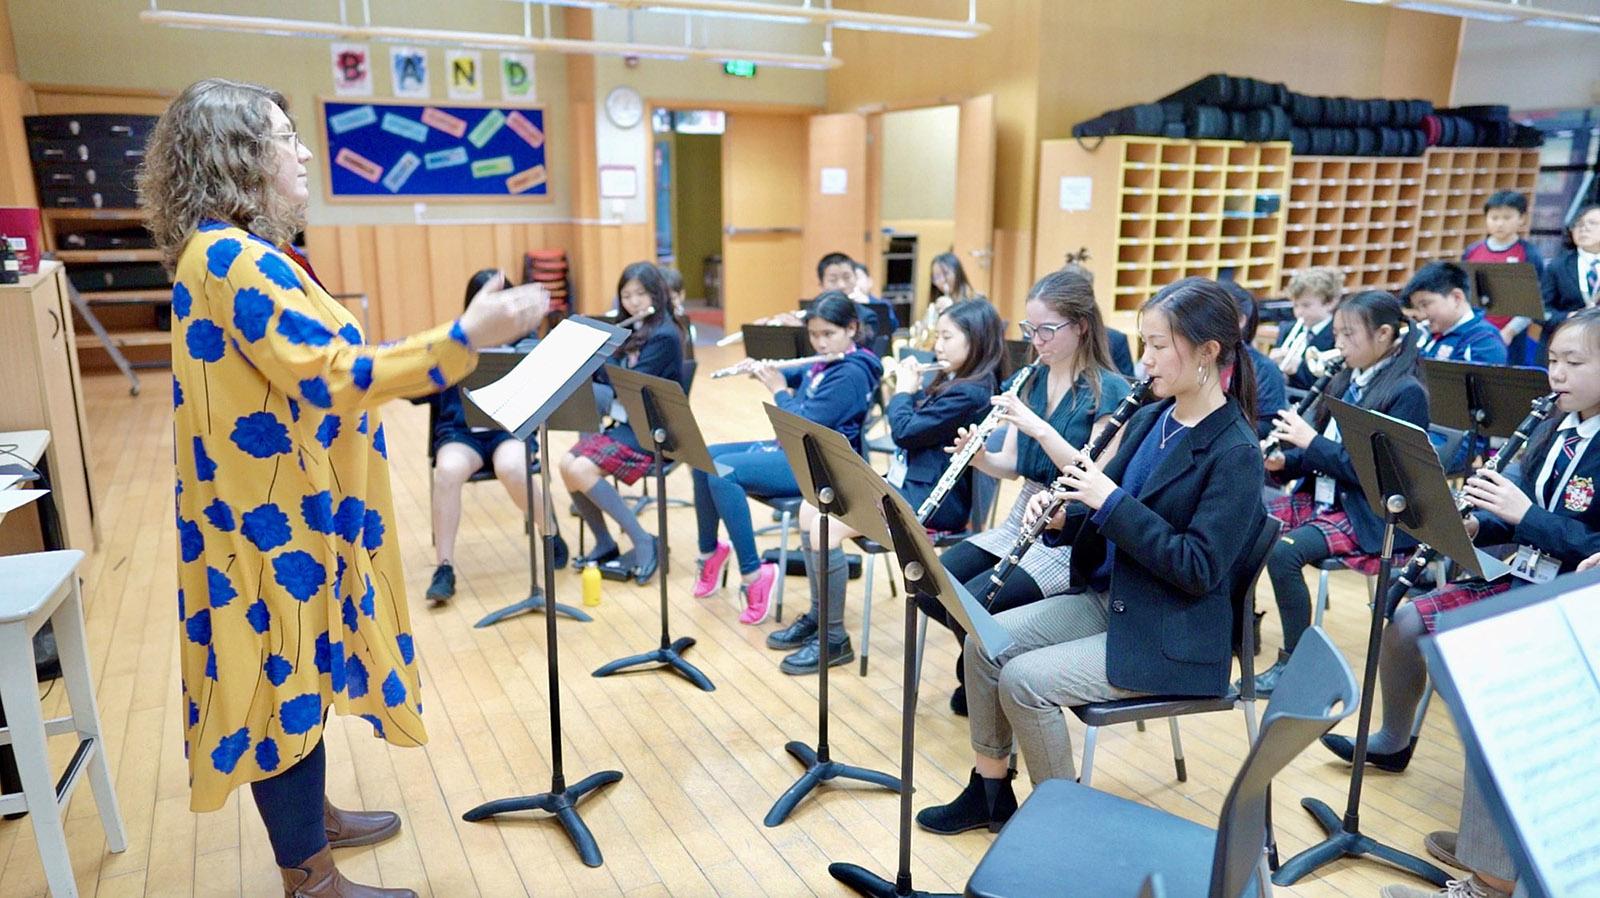 Rachel在上海浦东德威学校的音乐课堂授课